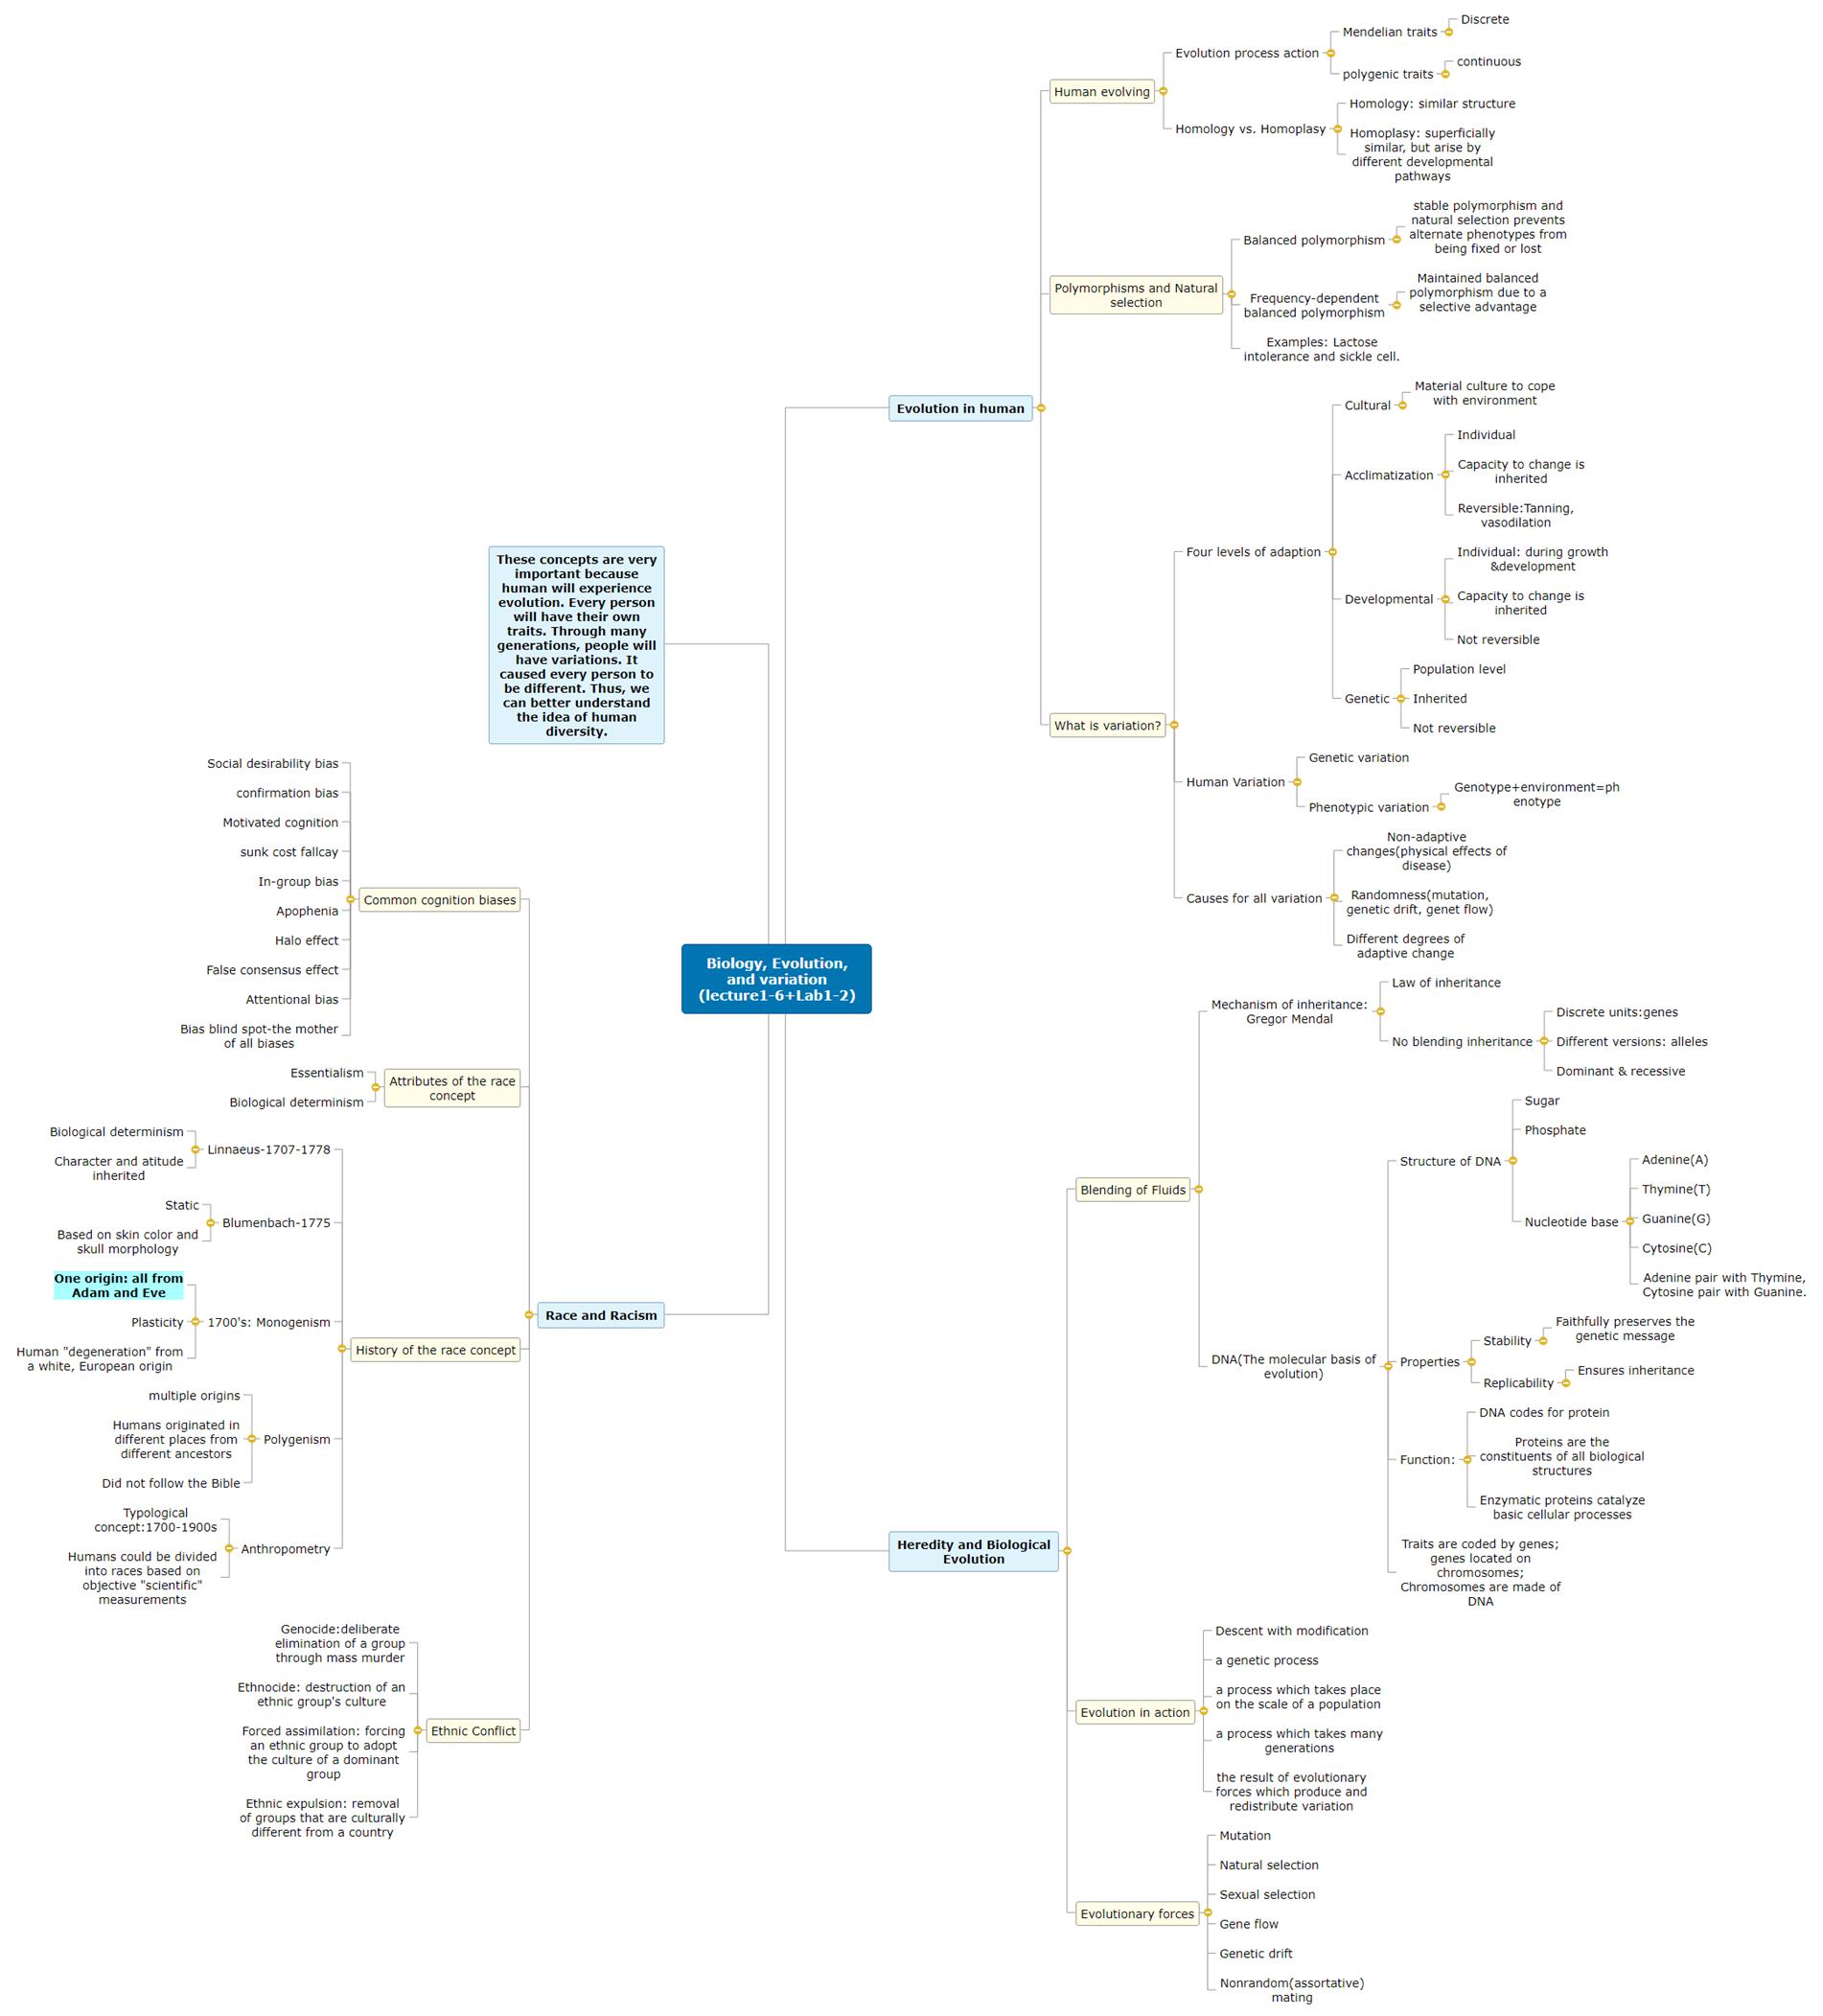 Biology, Evolution, and variation (lecture1-6+Lab1-2) Mind Map